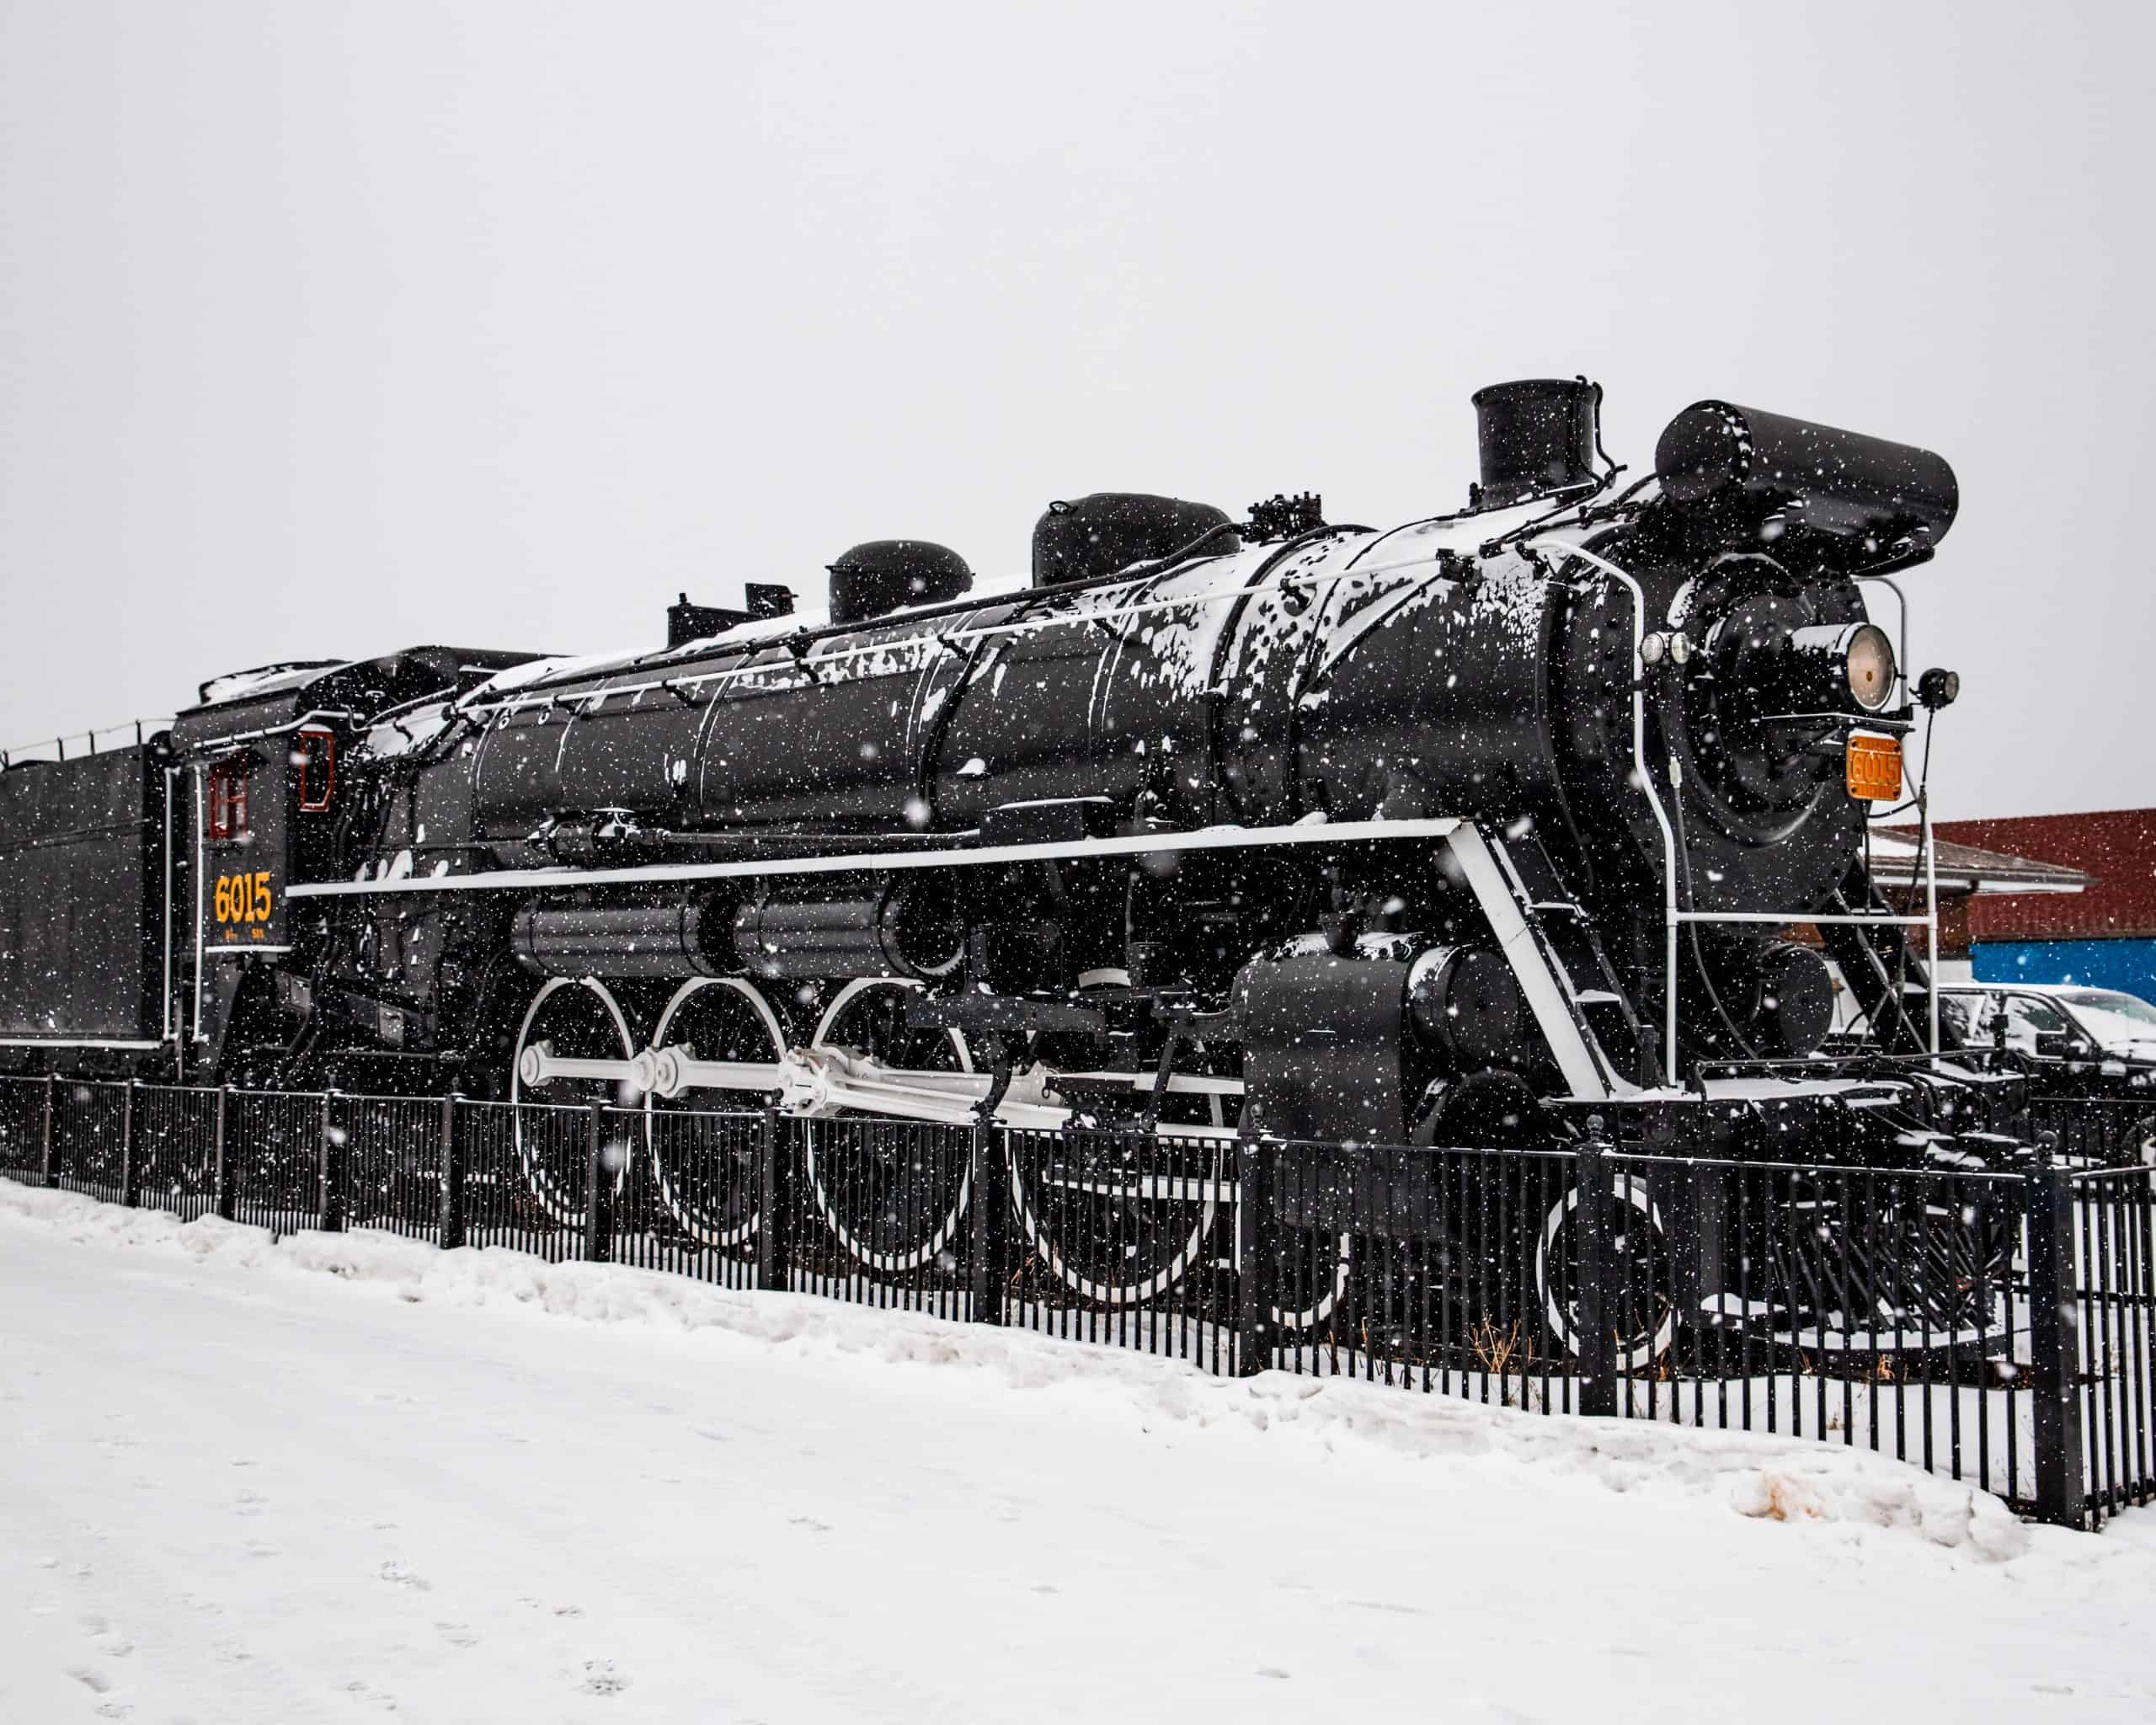 Canadian Rail Locomotive in the snow in Jasper, Canada